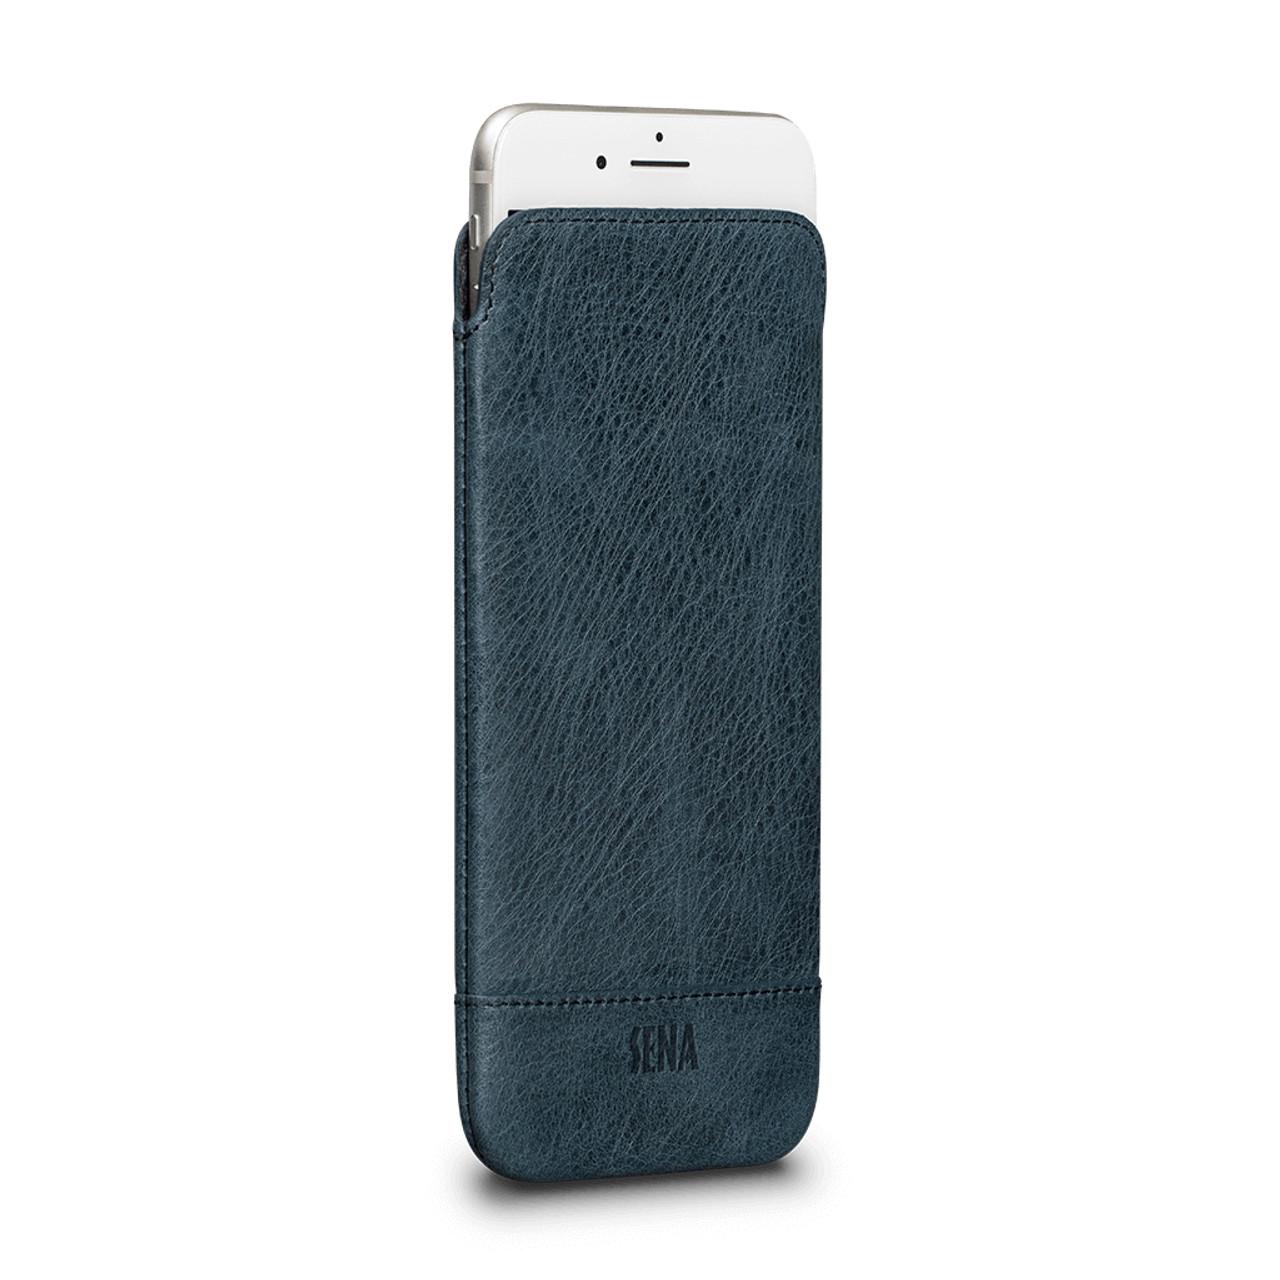 sena leather case iphone 8